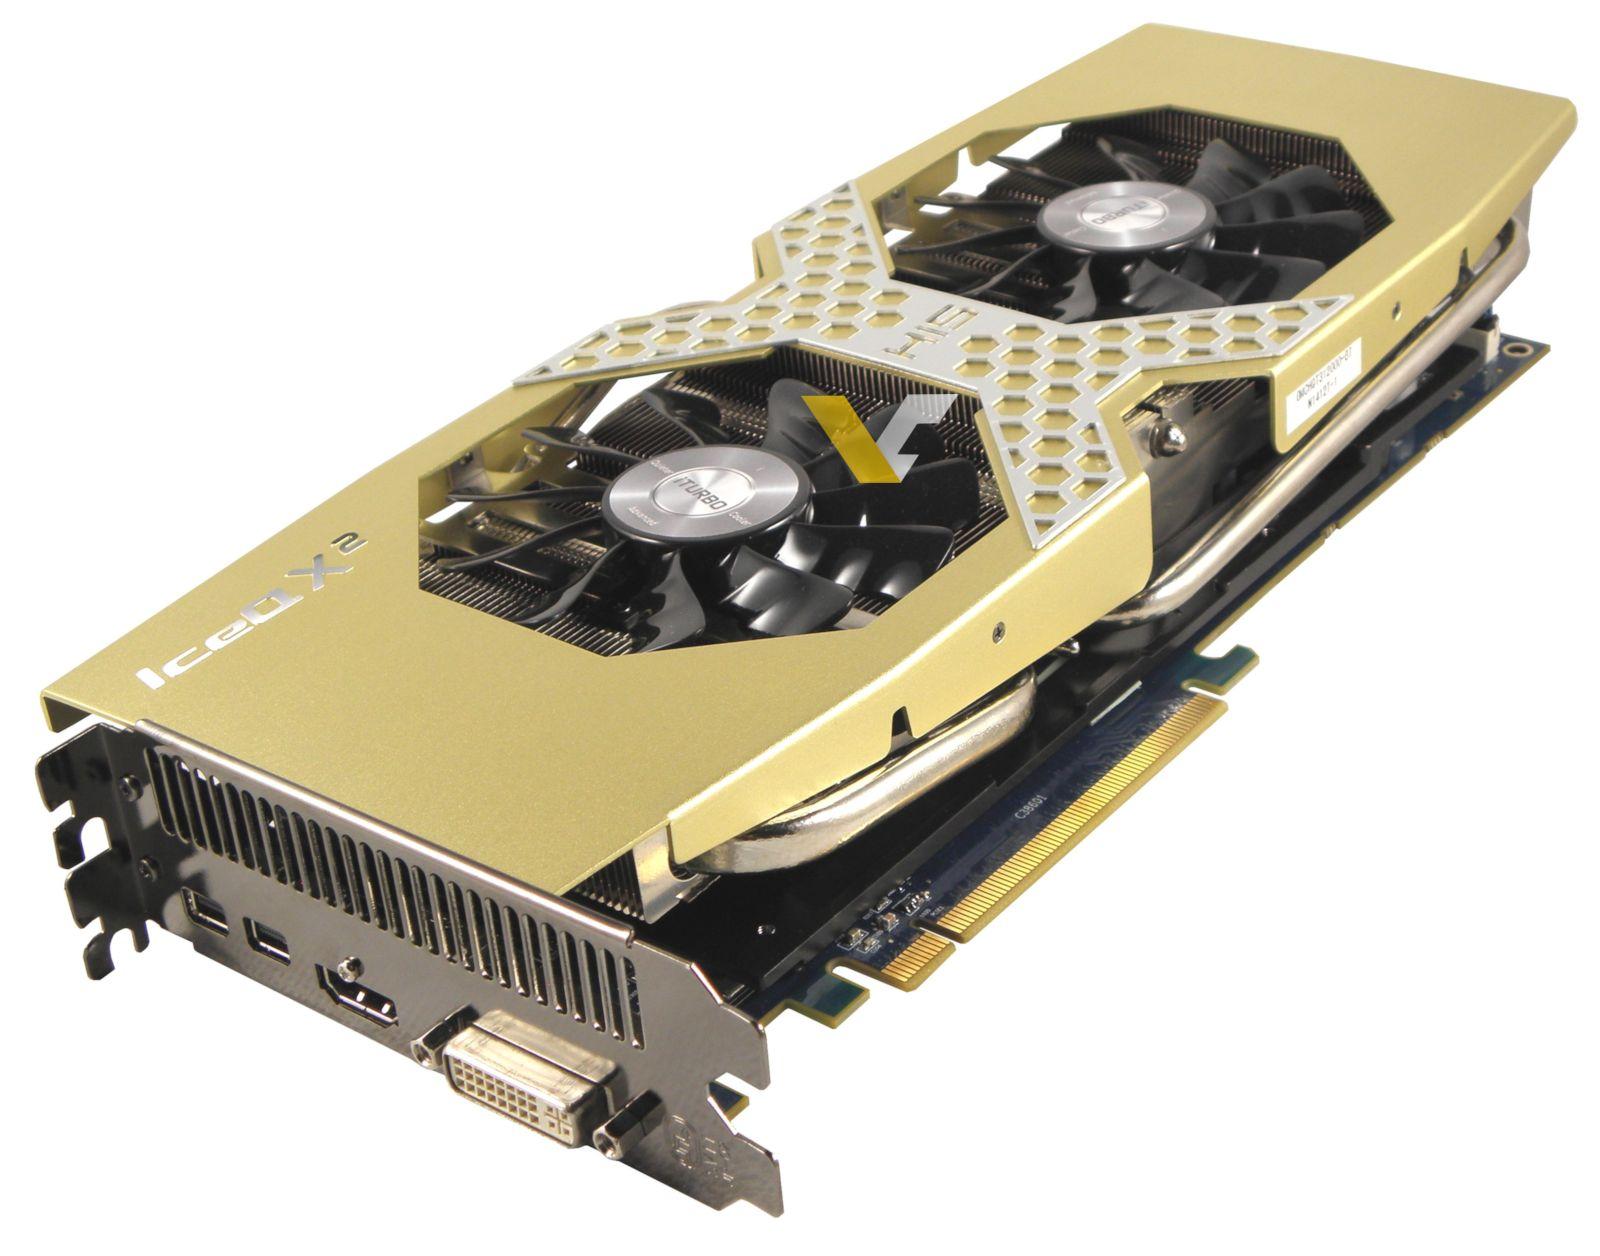 HIS Radeon R9 280, 285, 280X, 290X IceQ X2 - Overview @@ HIS